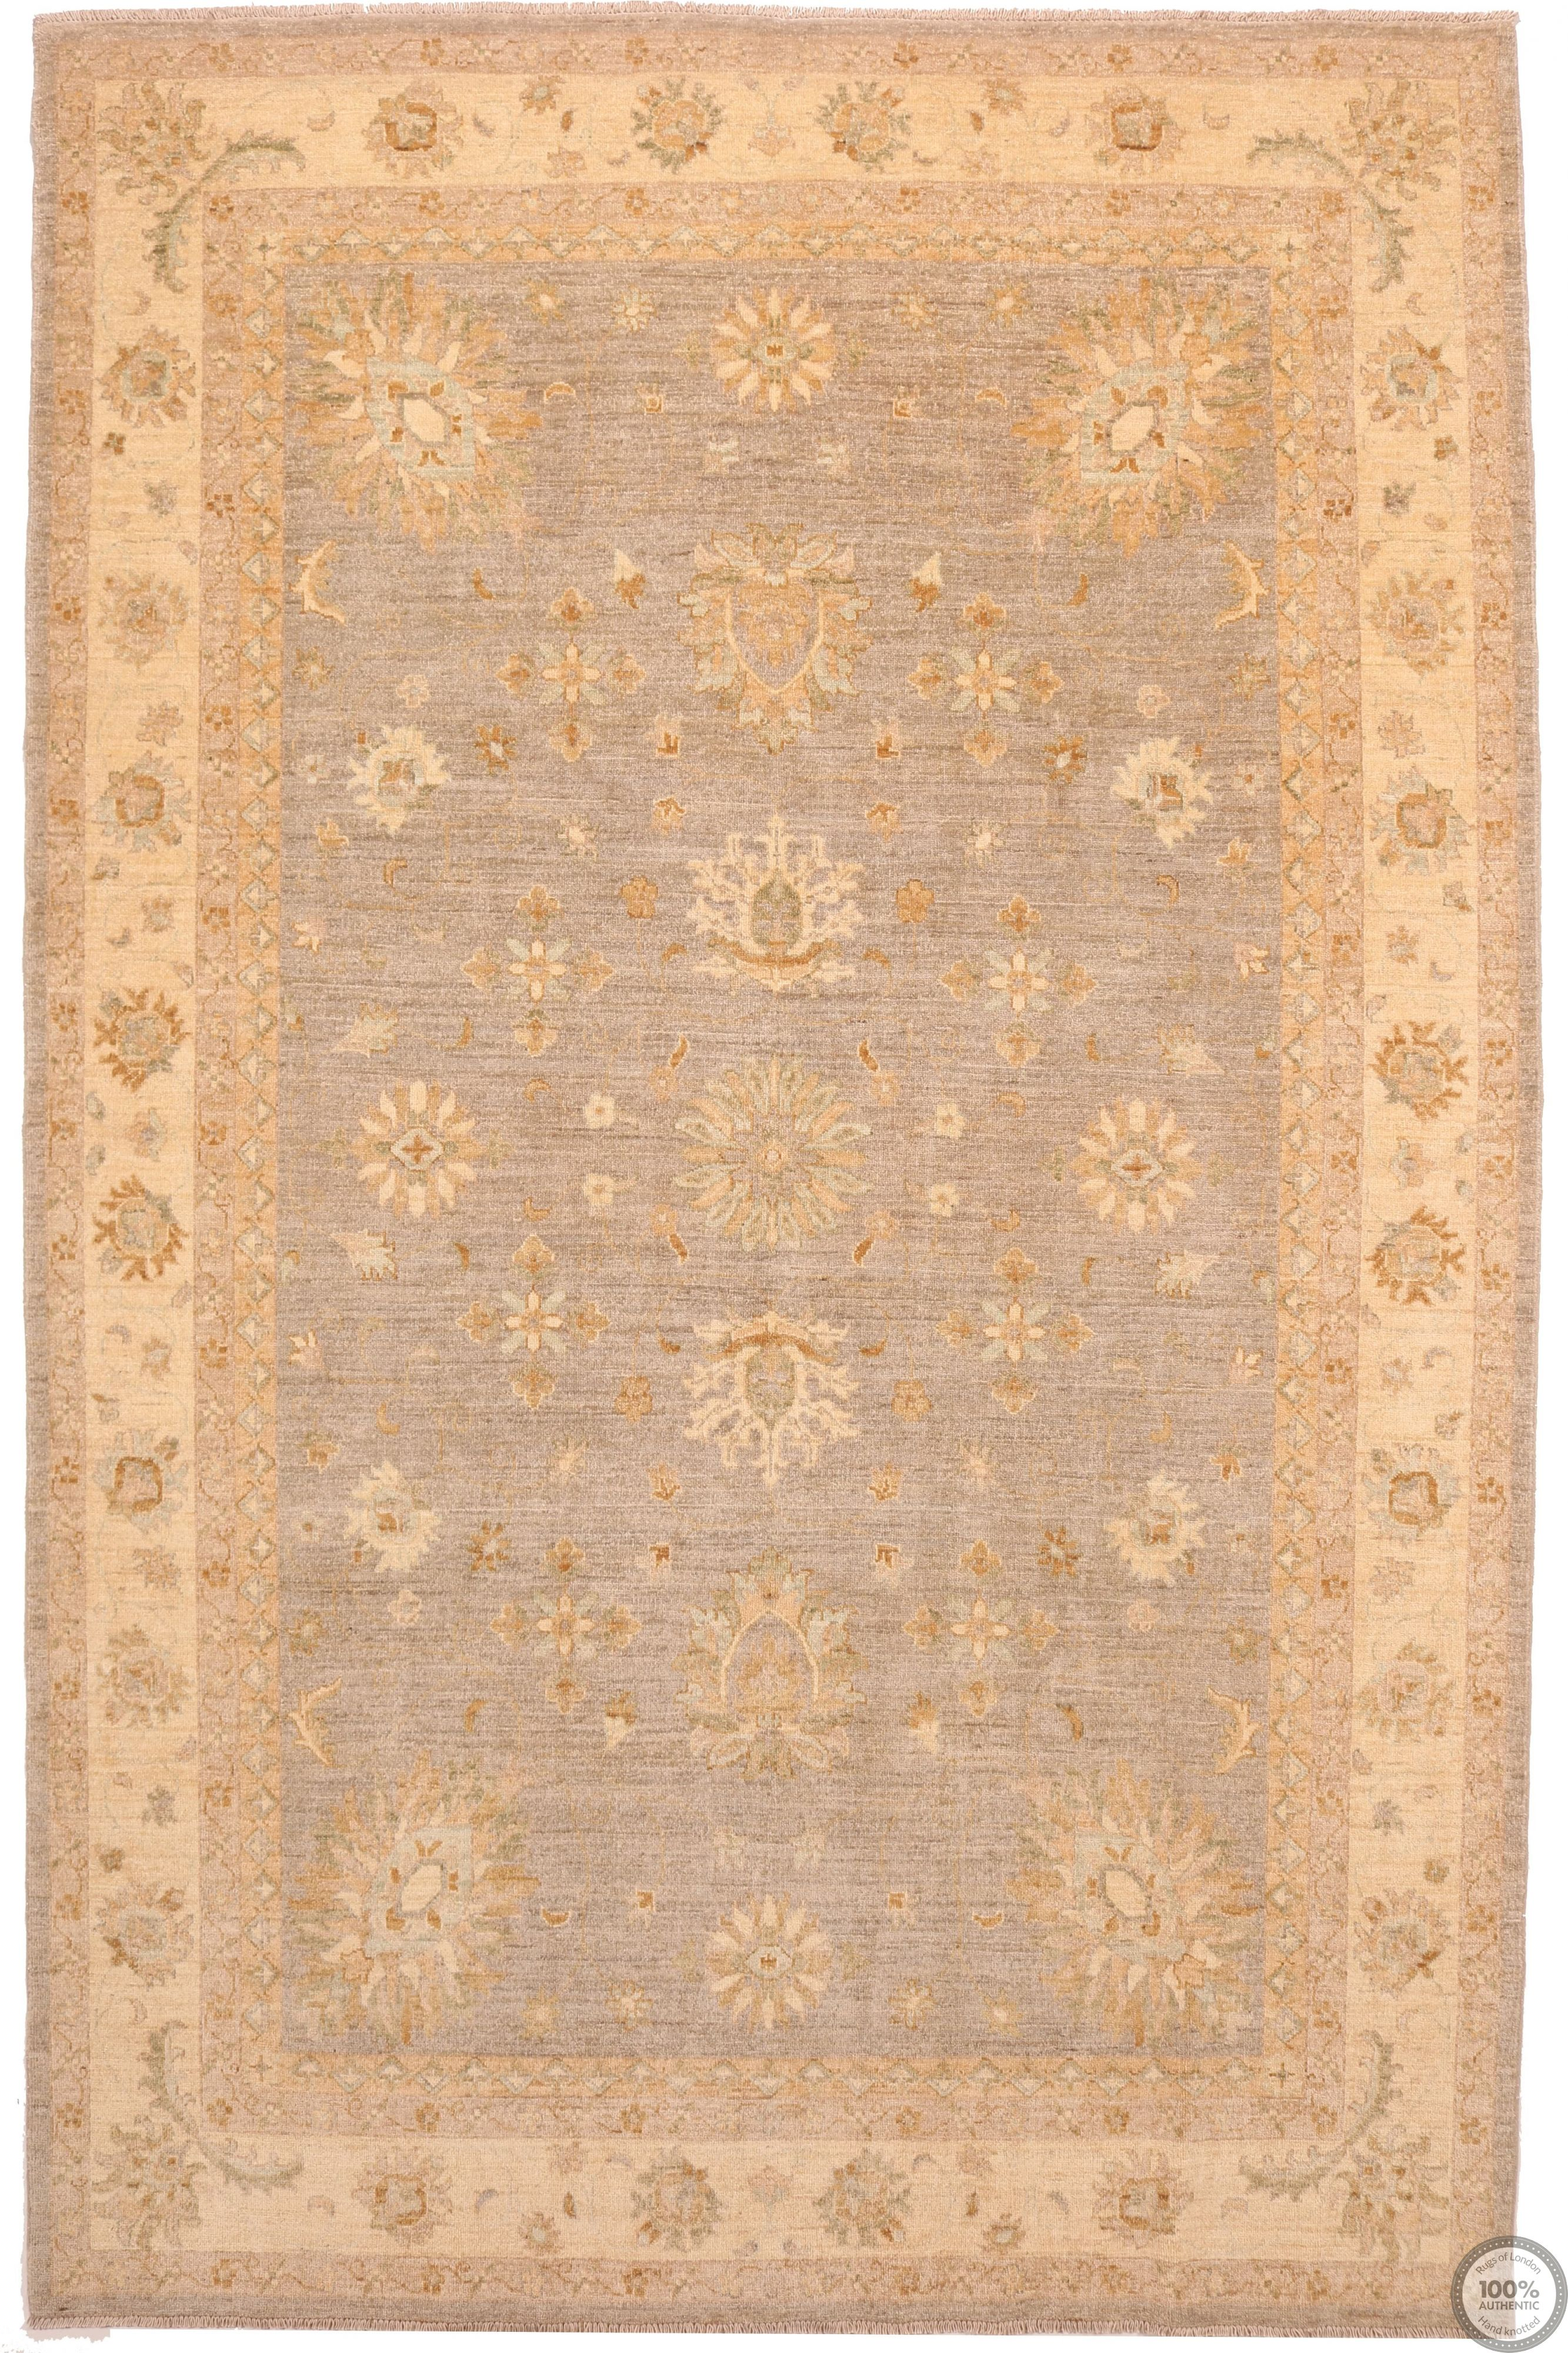 Garous Ziegler design rug 10'1 x 6'6